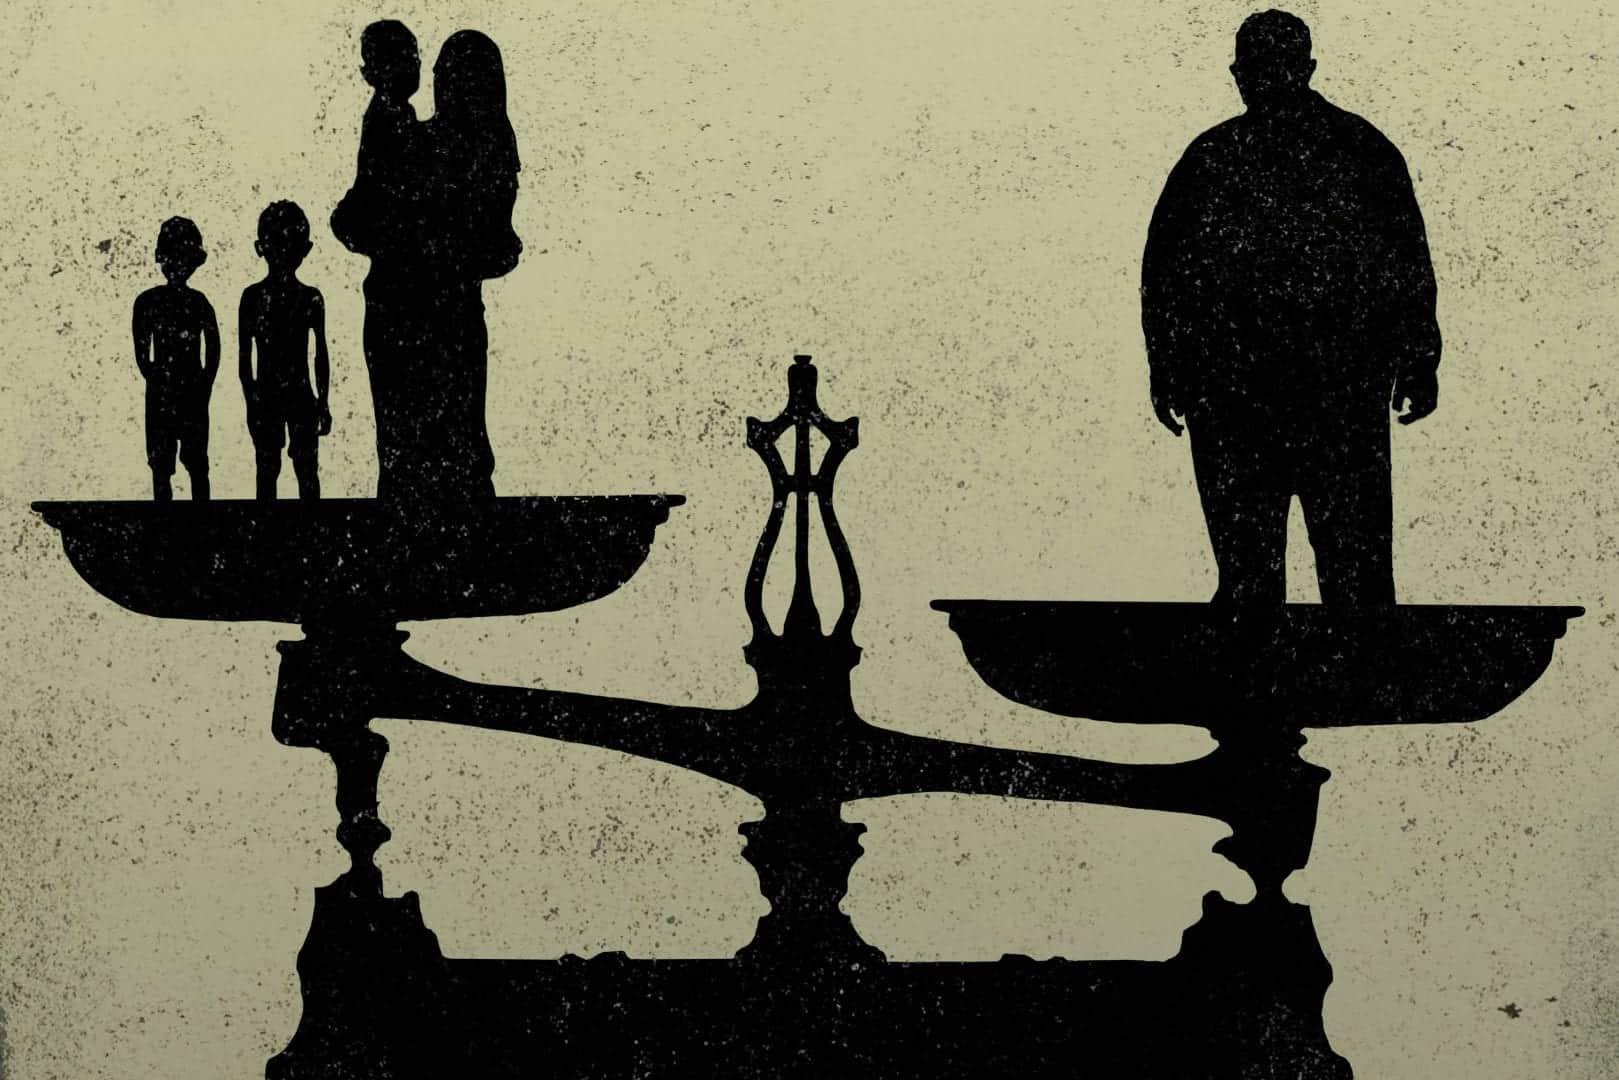 Afinal, o que foi o patriarcado? E o que mudou nos tempos atuais?